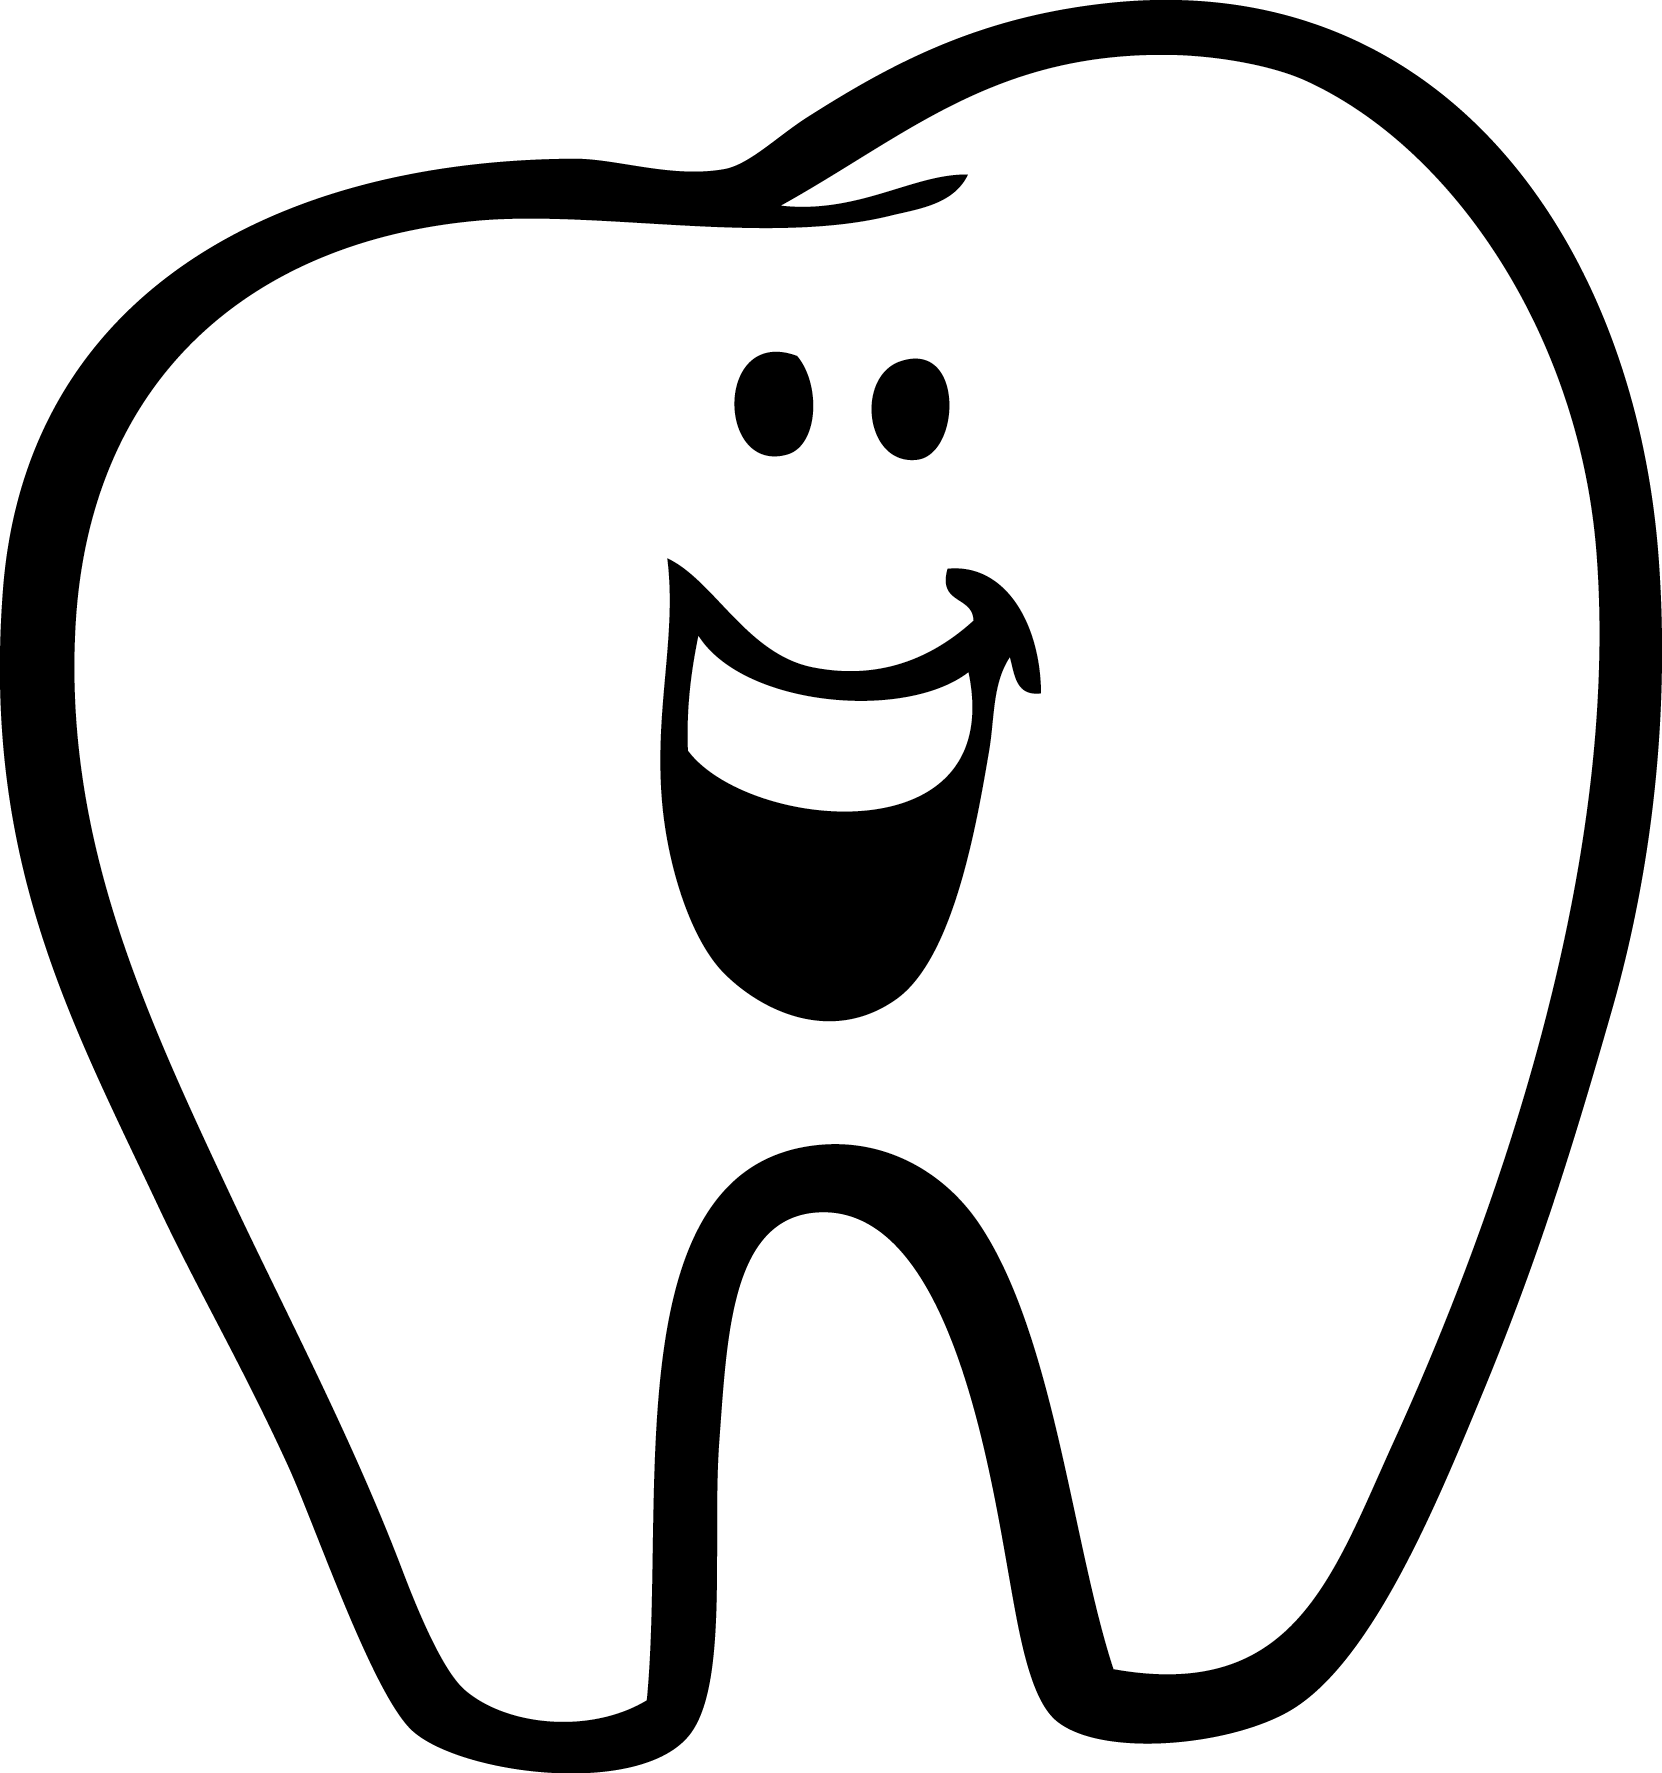 clipart transparent Clip art karangtalun clipartix. Drawing tooth cartoon